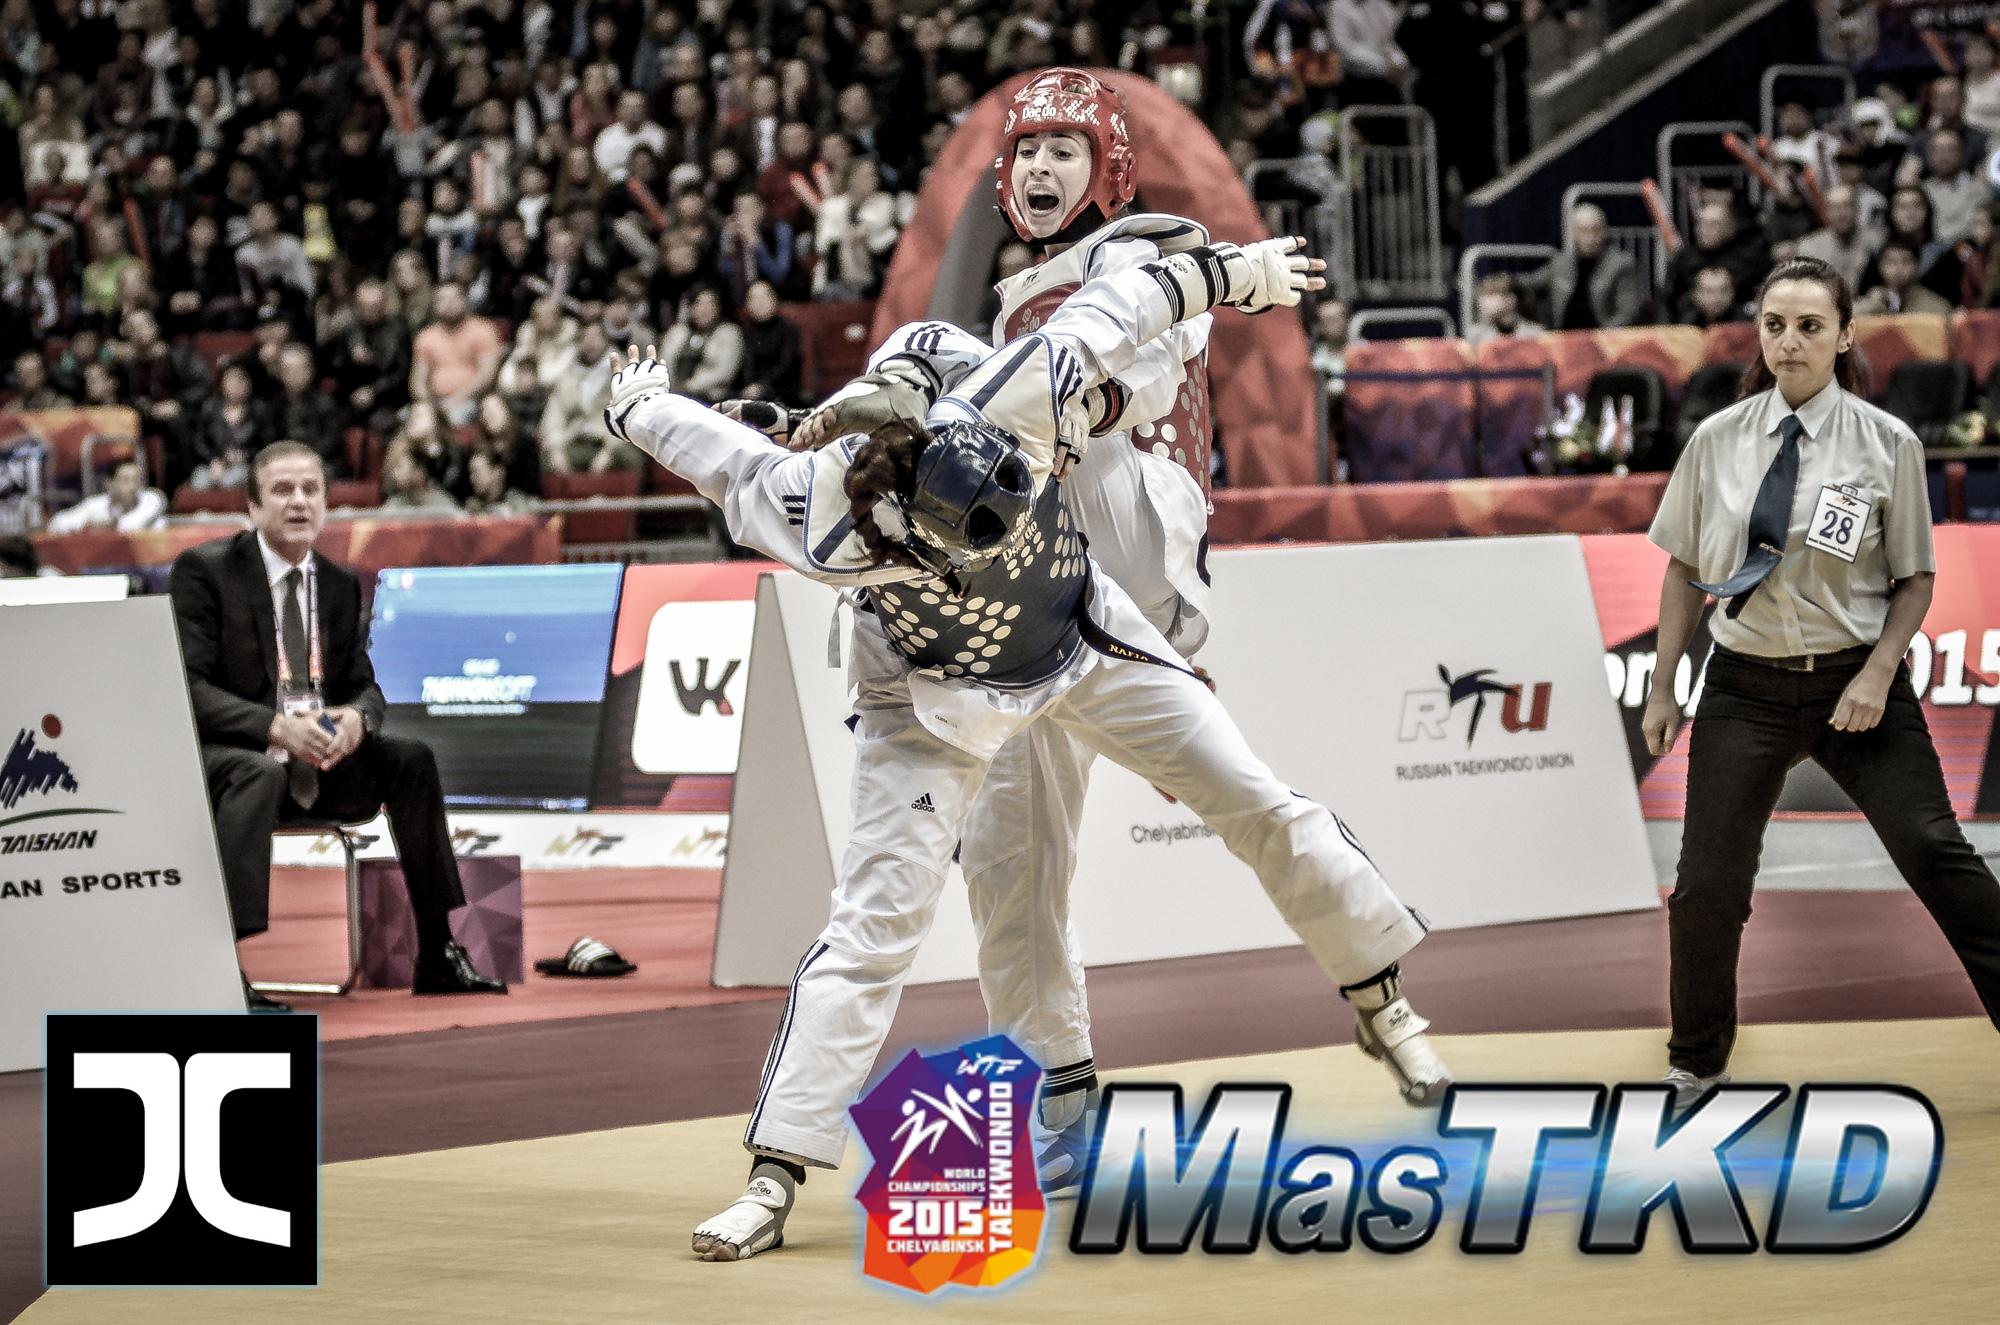 08_JCalicu-Mejores-imagenes-del-Mundial-de-Taekwondo_d5